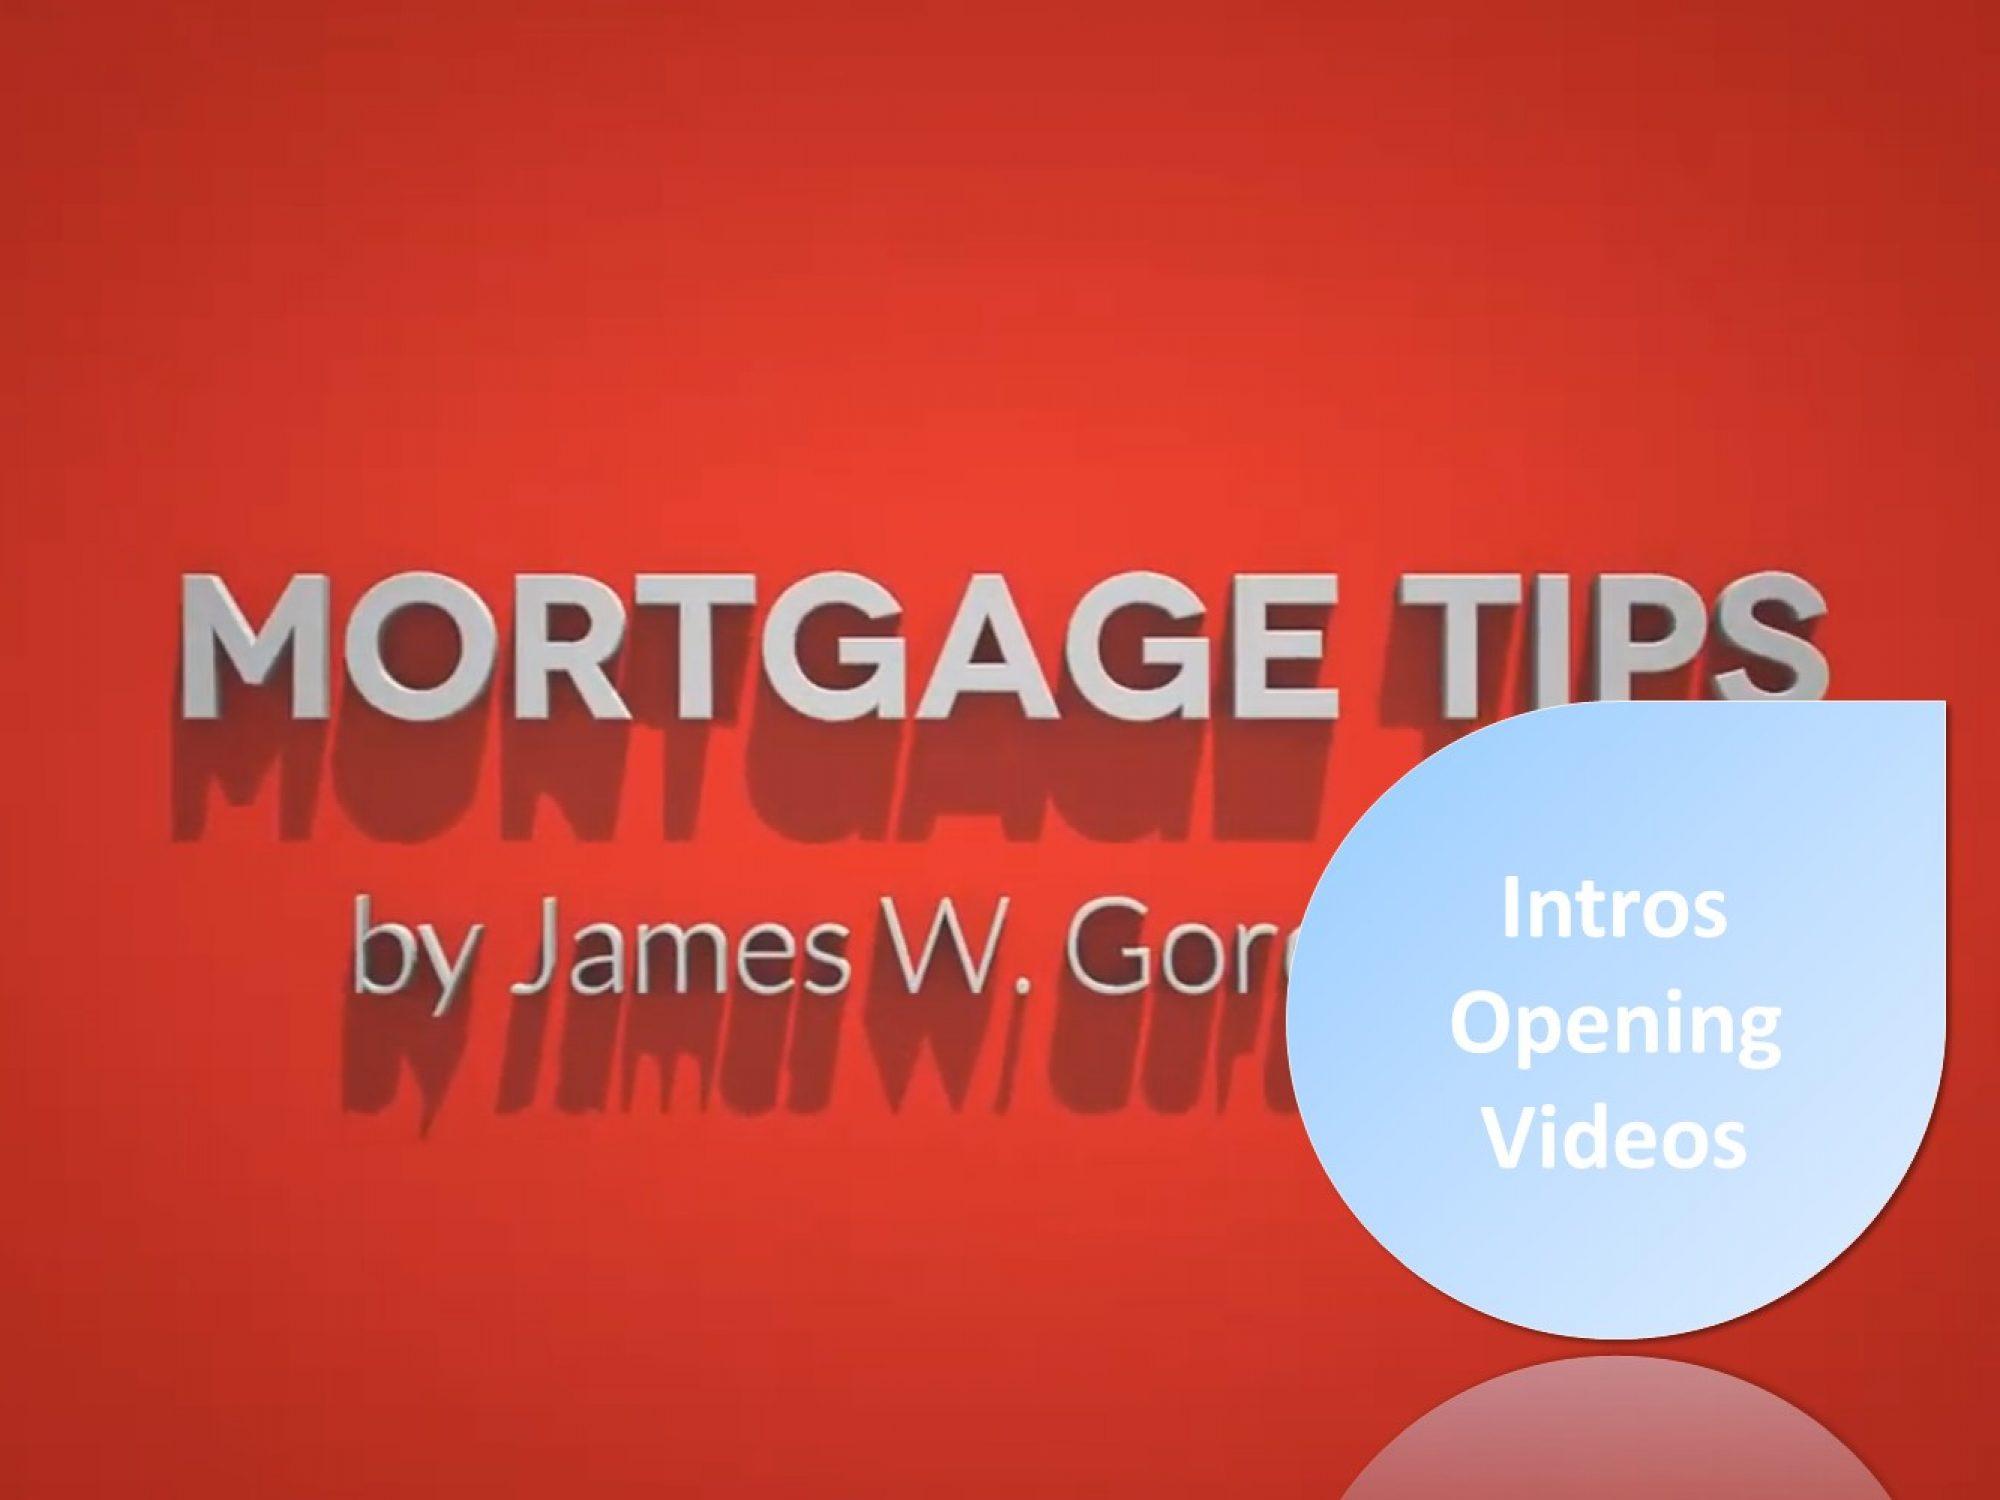 Intros   Opening Videos